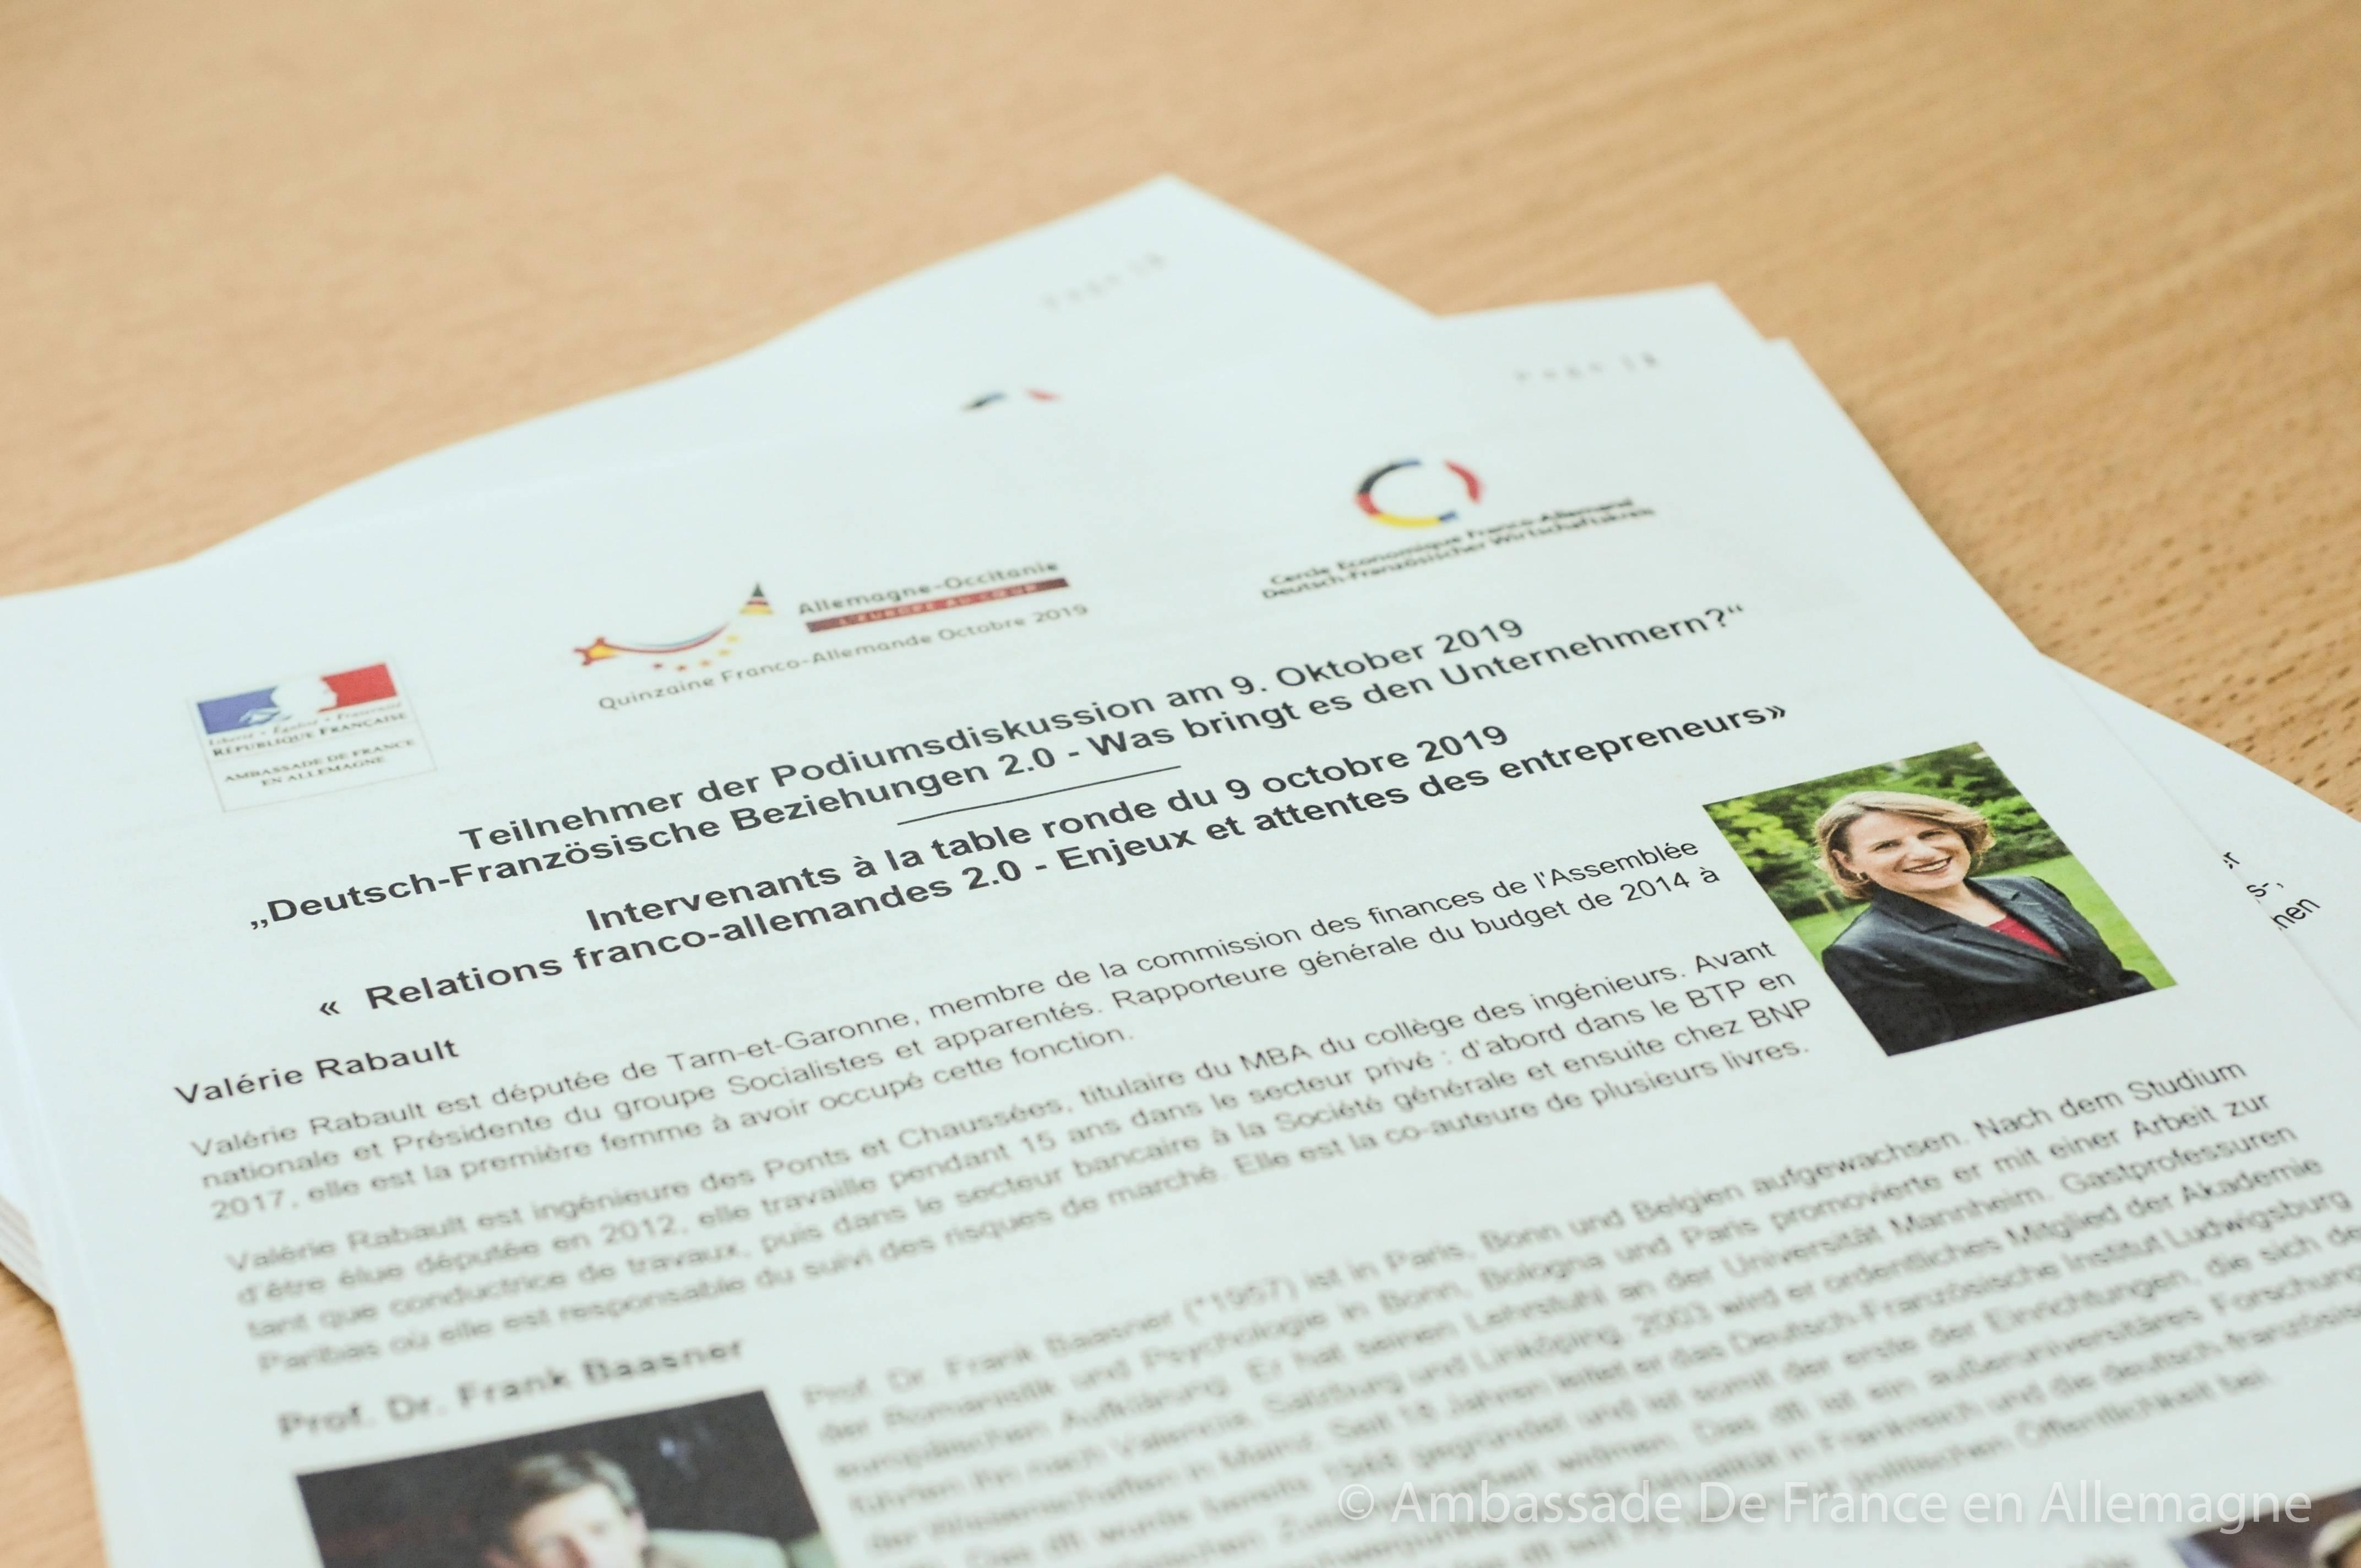 Programme relations franco-allemandes 2.0 - Ambassade de France - Quinzaine franco-allemande d'Occitanie 2019